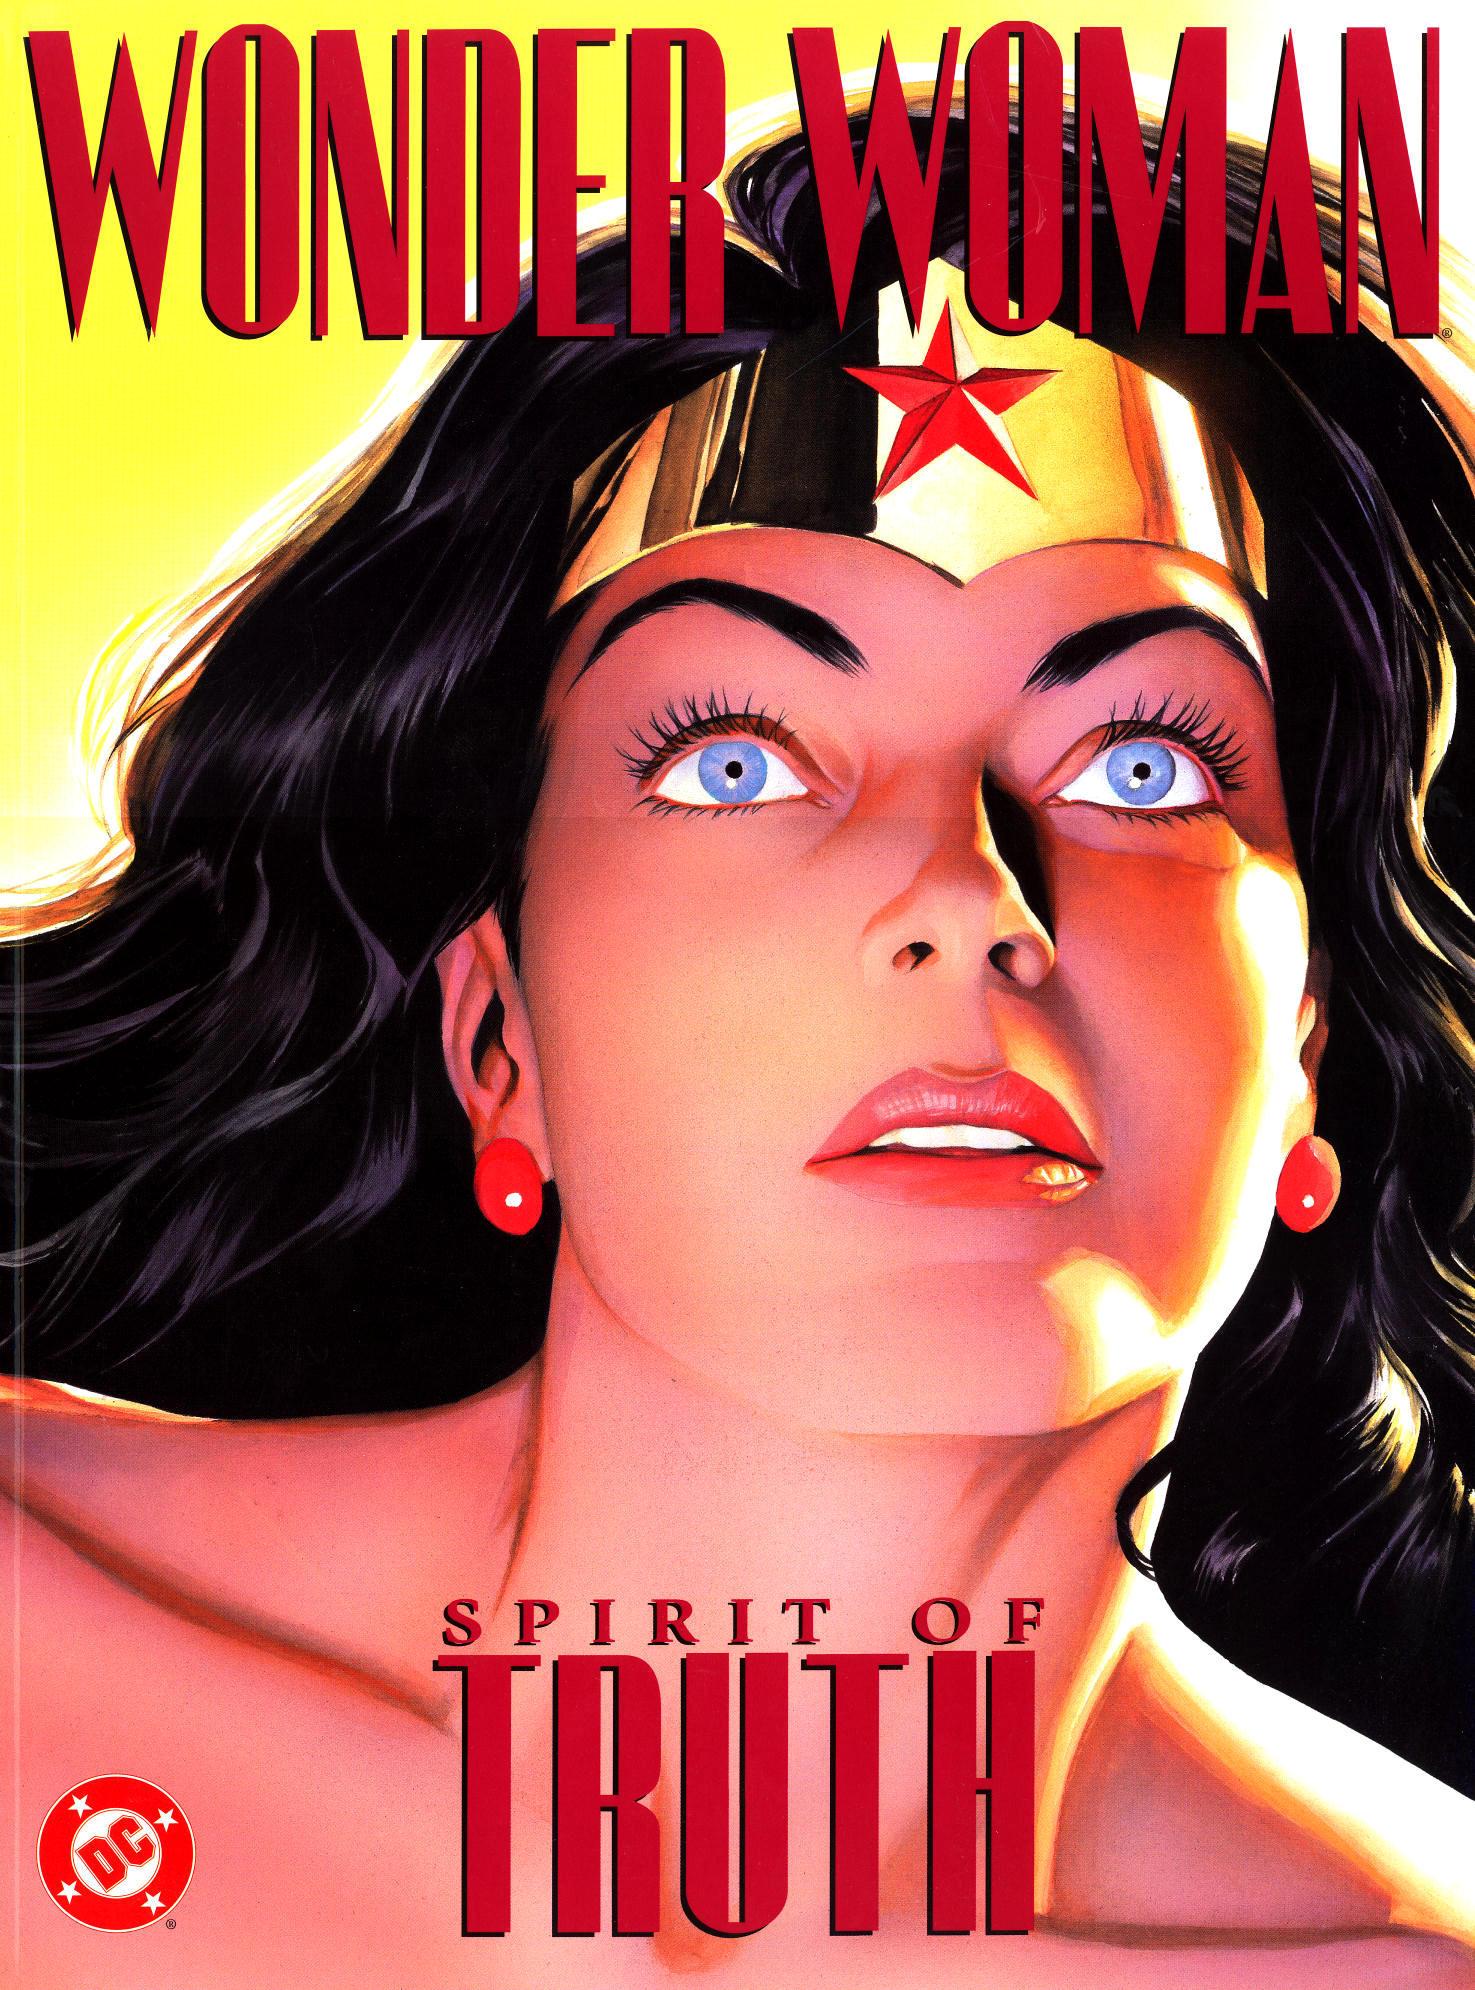 Read online Wonder Woman: Spirit of Truth comic -  Issue # Full - 1